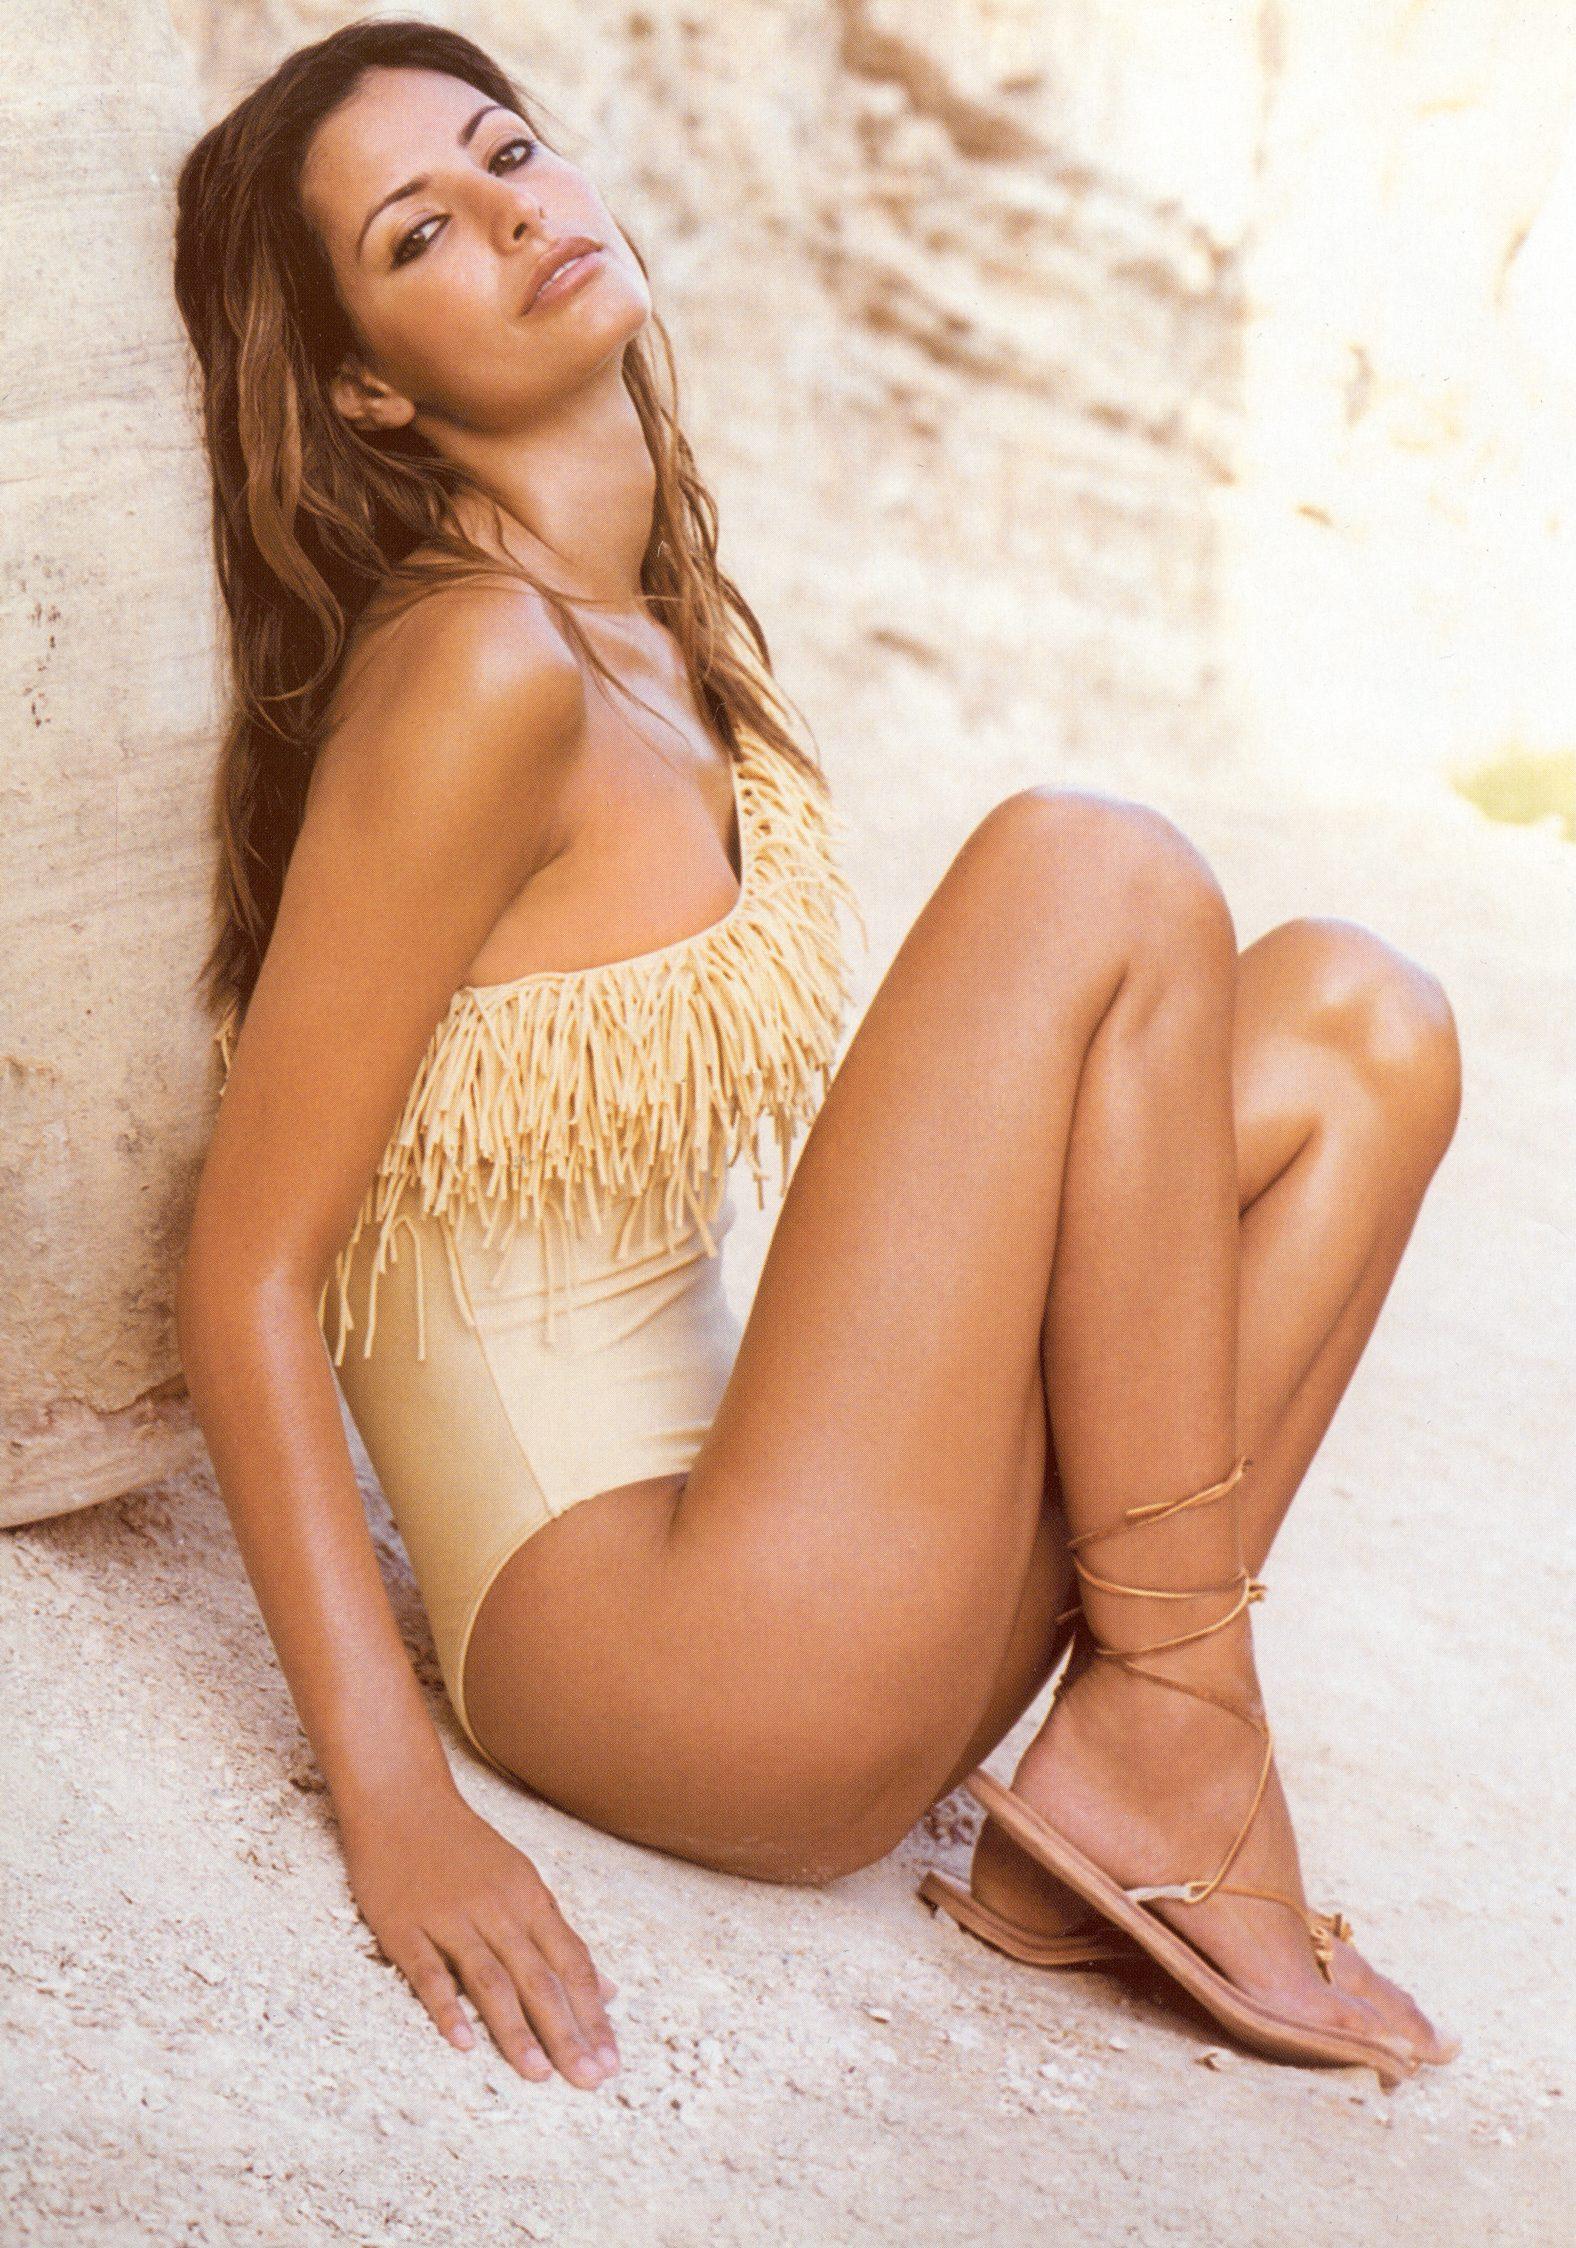 lingerie Young Elsa Benitez naked photo 2017